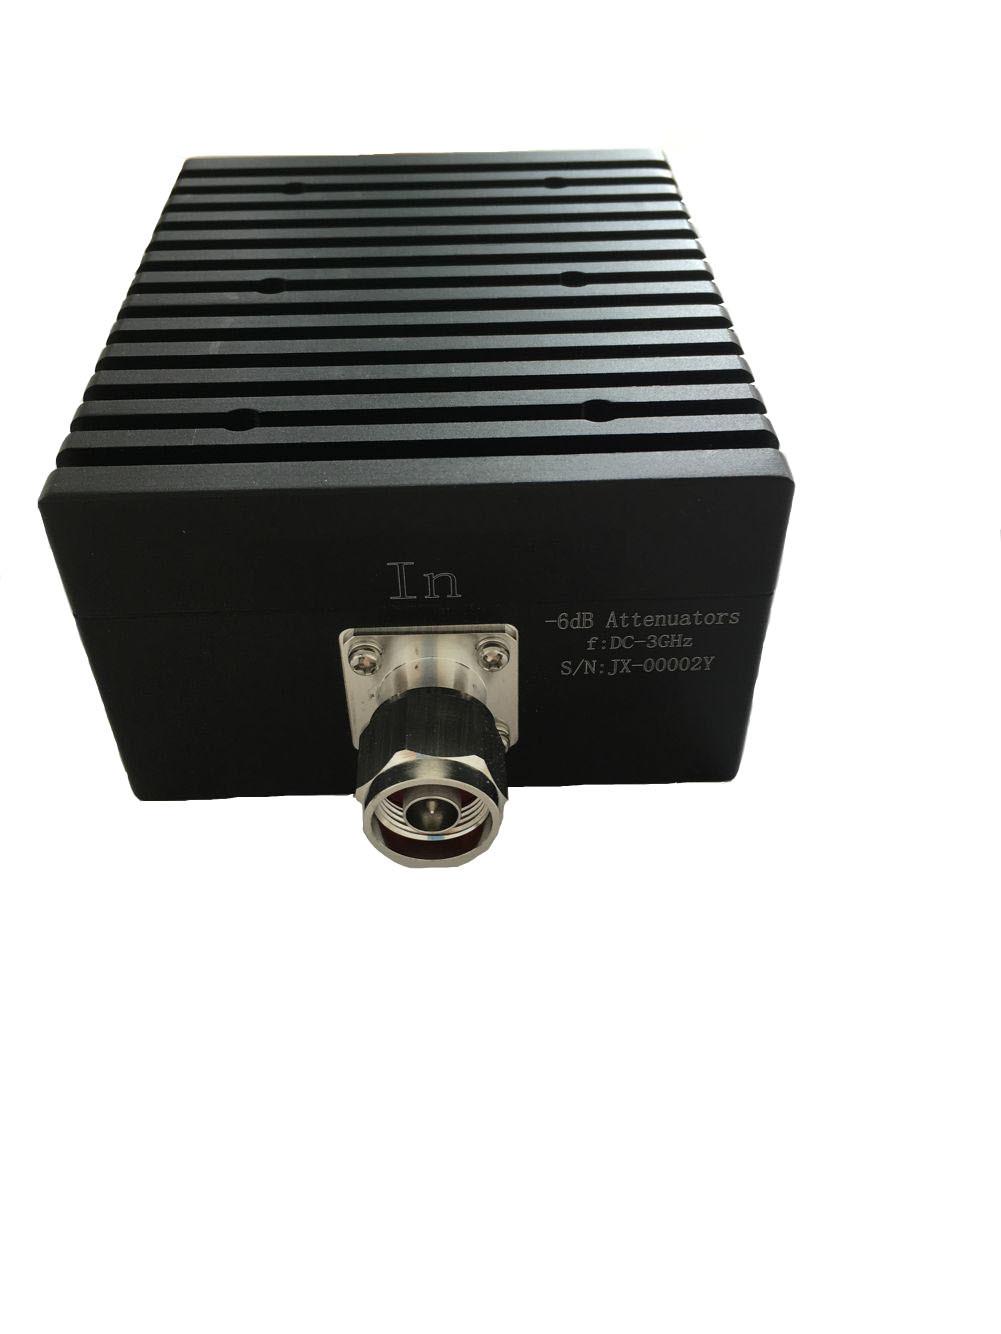 Lom Pim Attenuators in Microwave Area